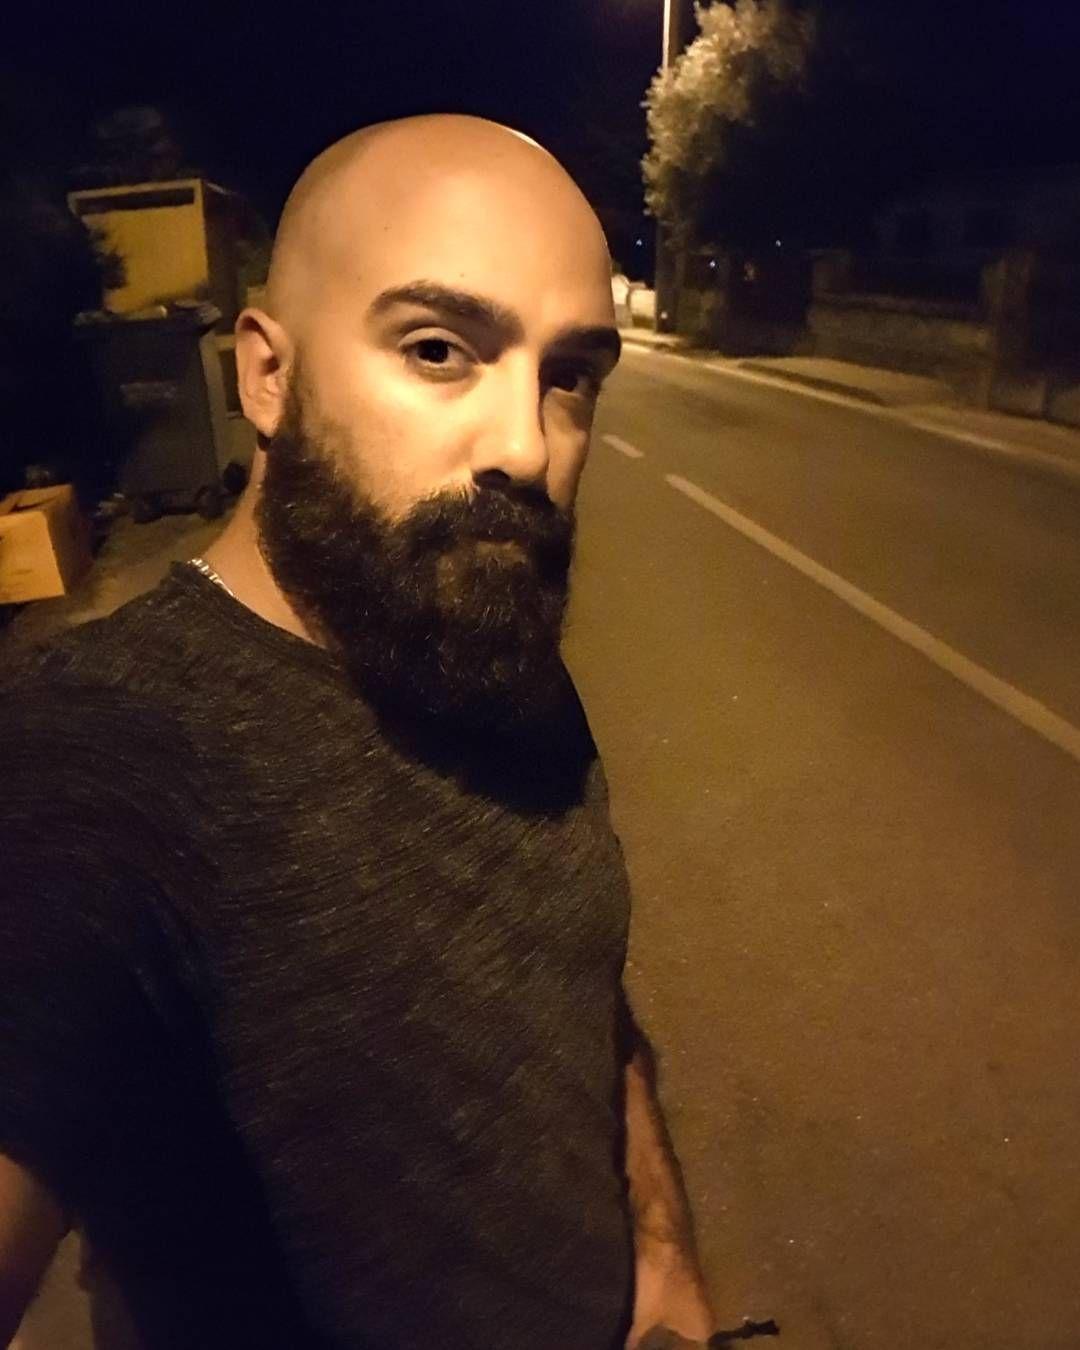 Bad mens haircuts bynight selfie beard beardman bald  beards  pinterest  beard care